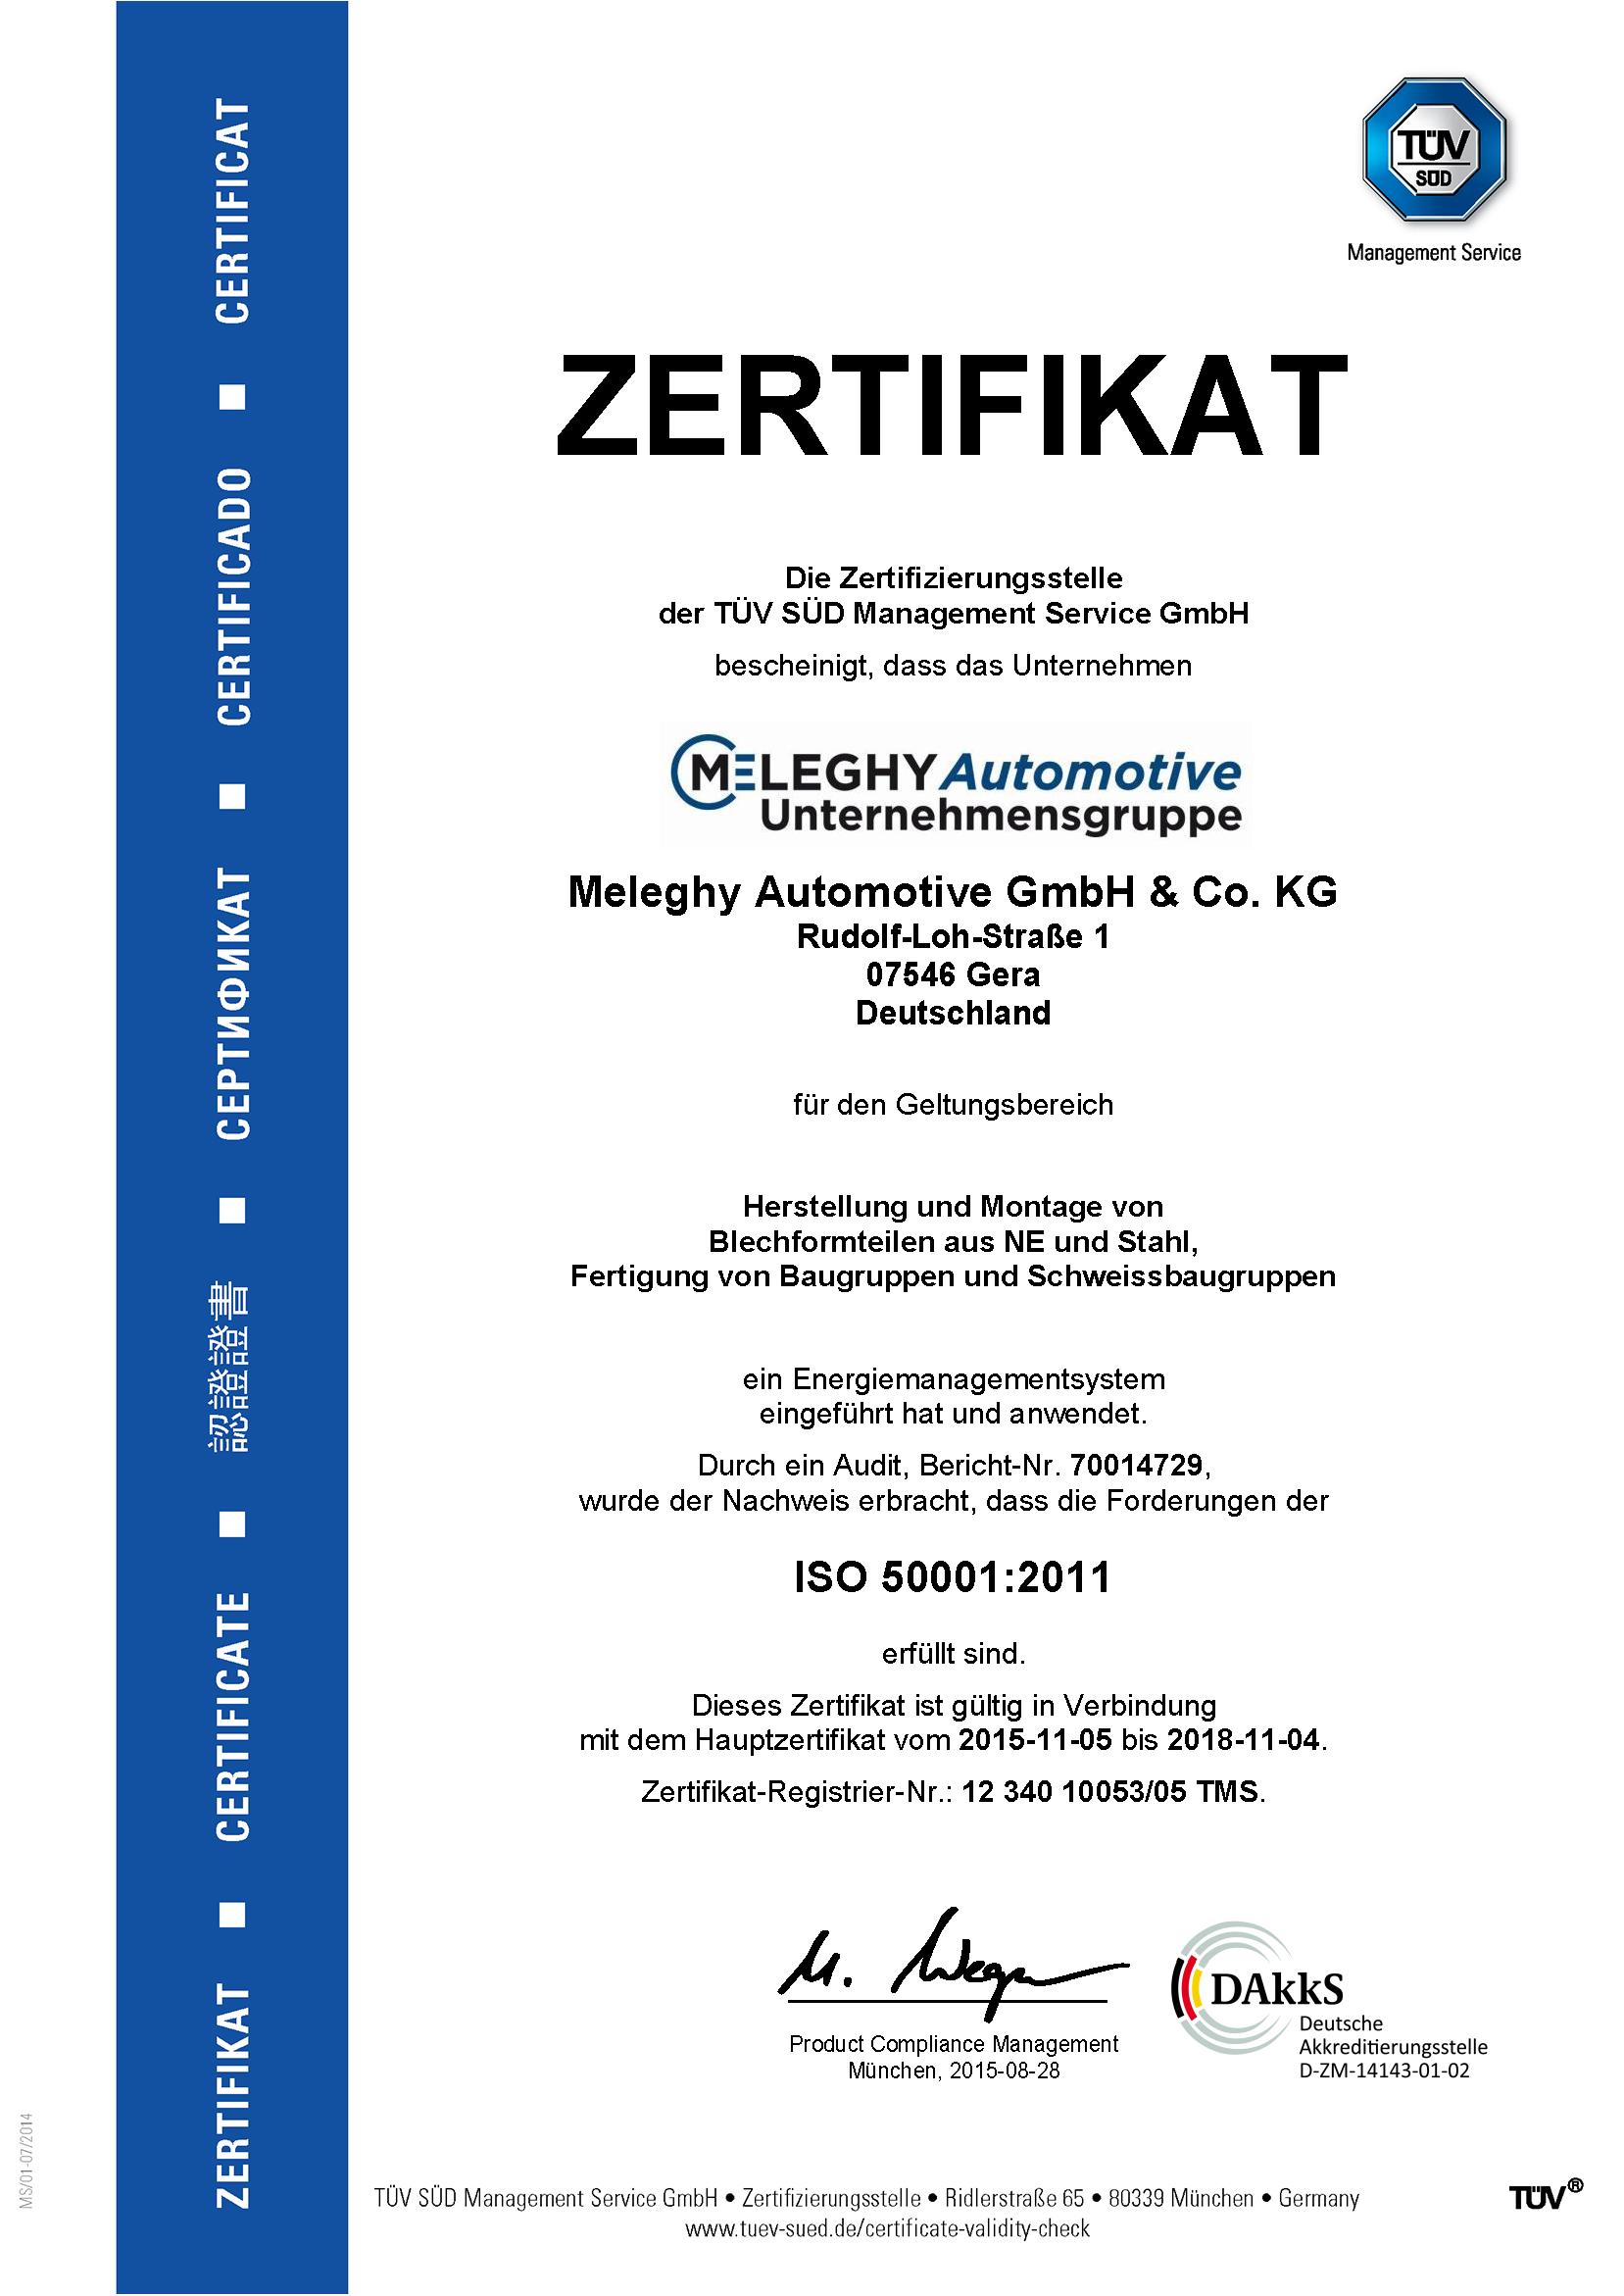 Meleghy Automotive Gera Zertifikat ISO 50001_de